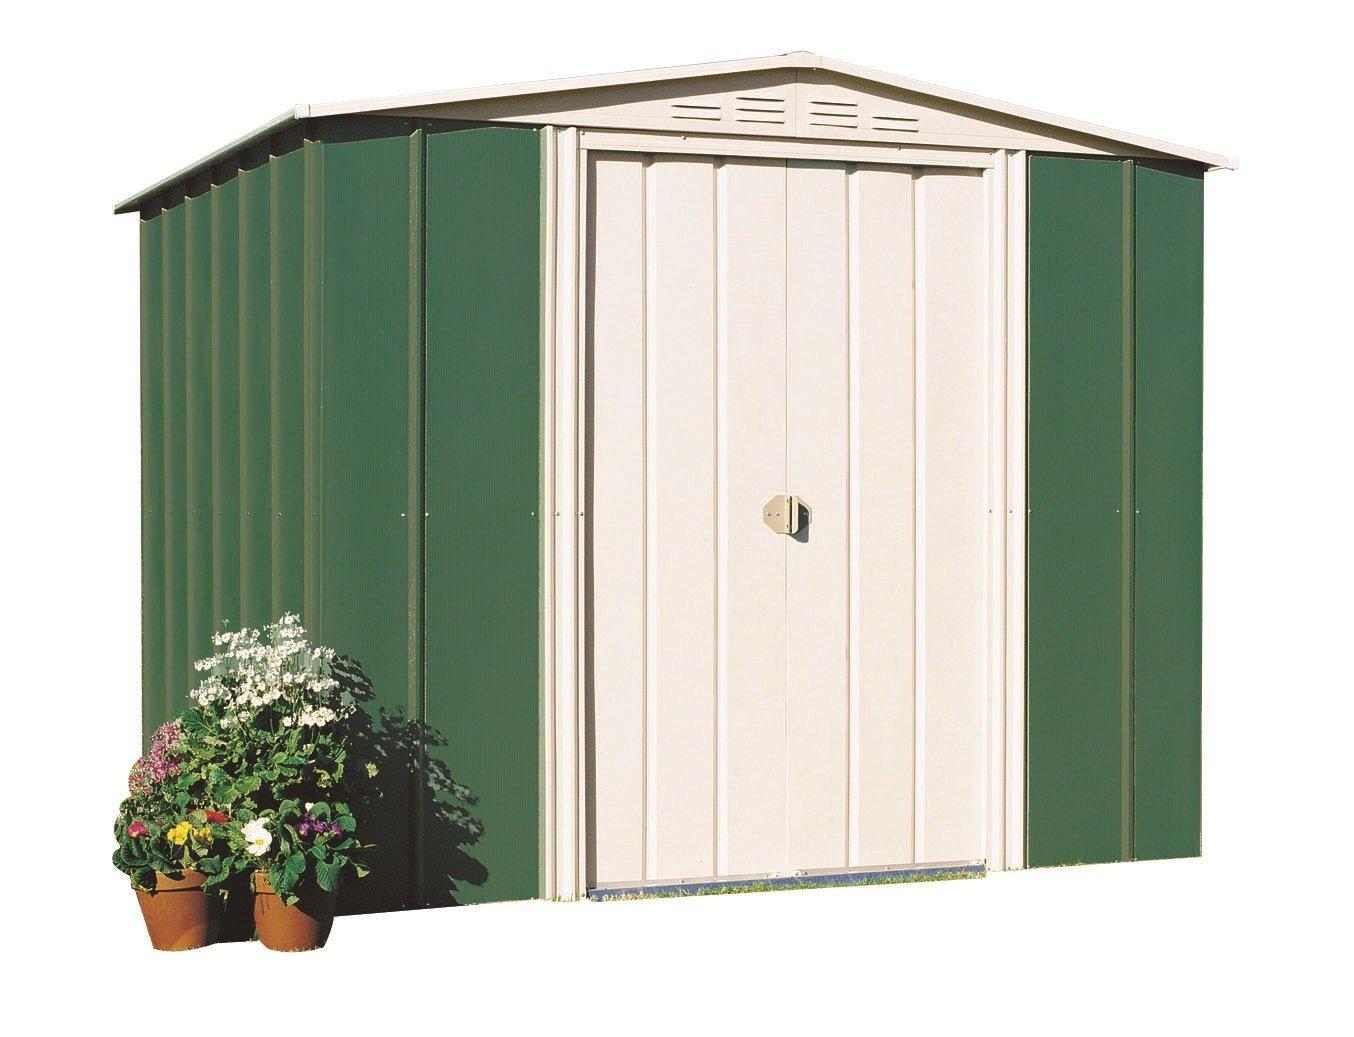 federation green 6 x 7 ex double sliding doors - Garden Sheds 6x7